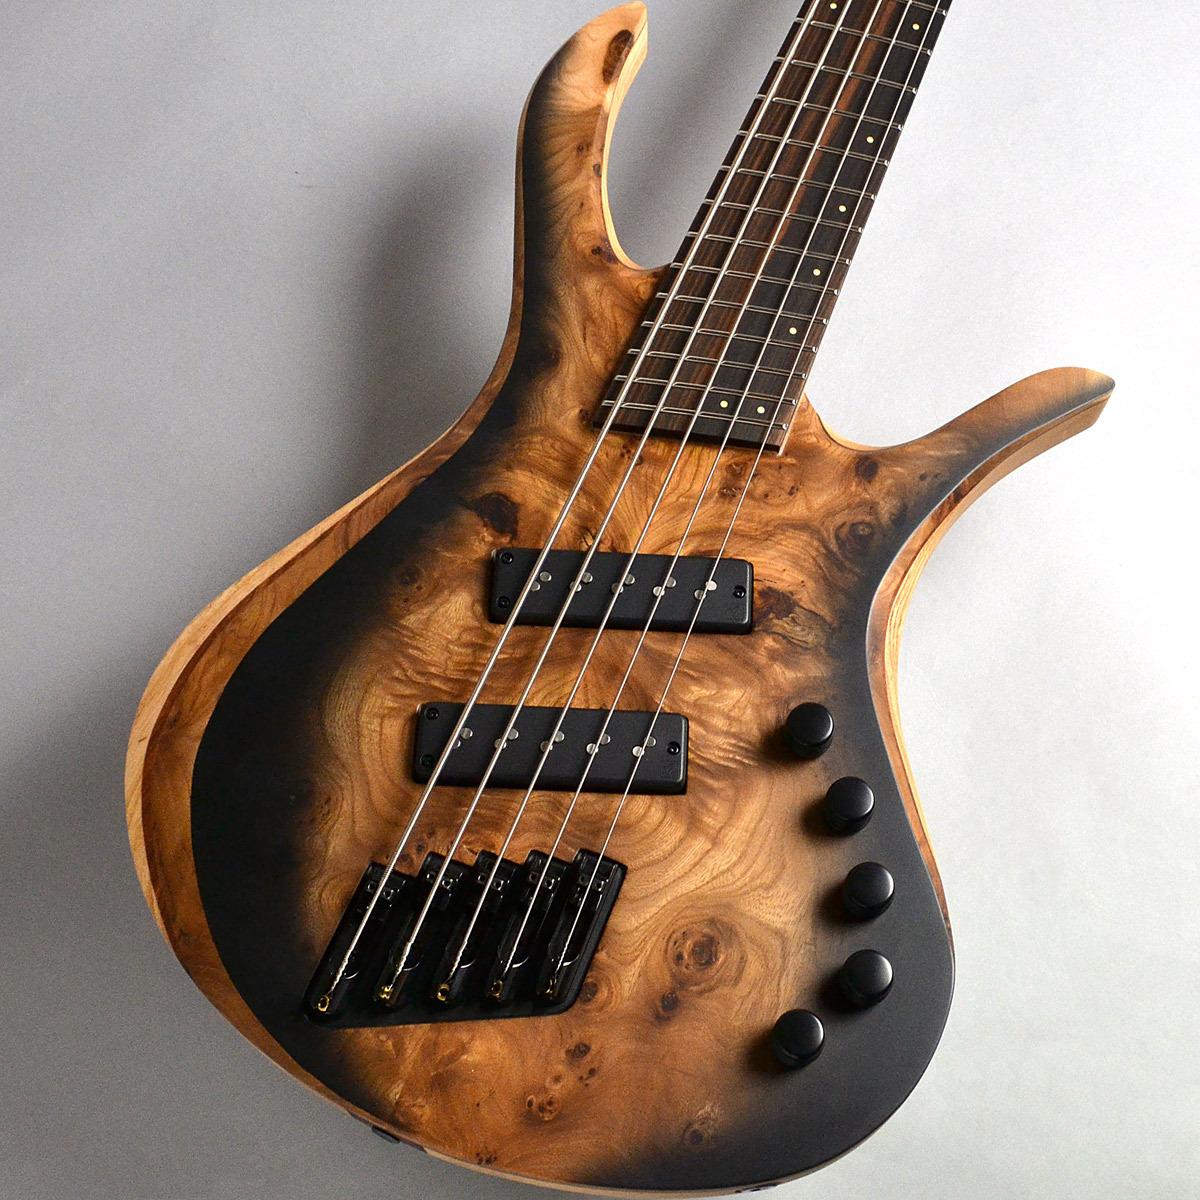 SKERVESEN GUITARS Bronto 37-5 Burl Elm/Black Burst Matt エレキベース(5弦) 【スケルヴェセン ギターズ】【新宿PePe店】